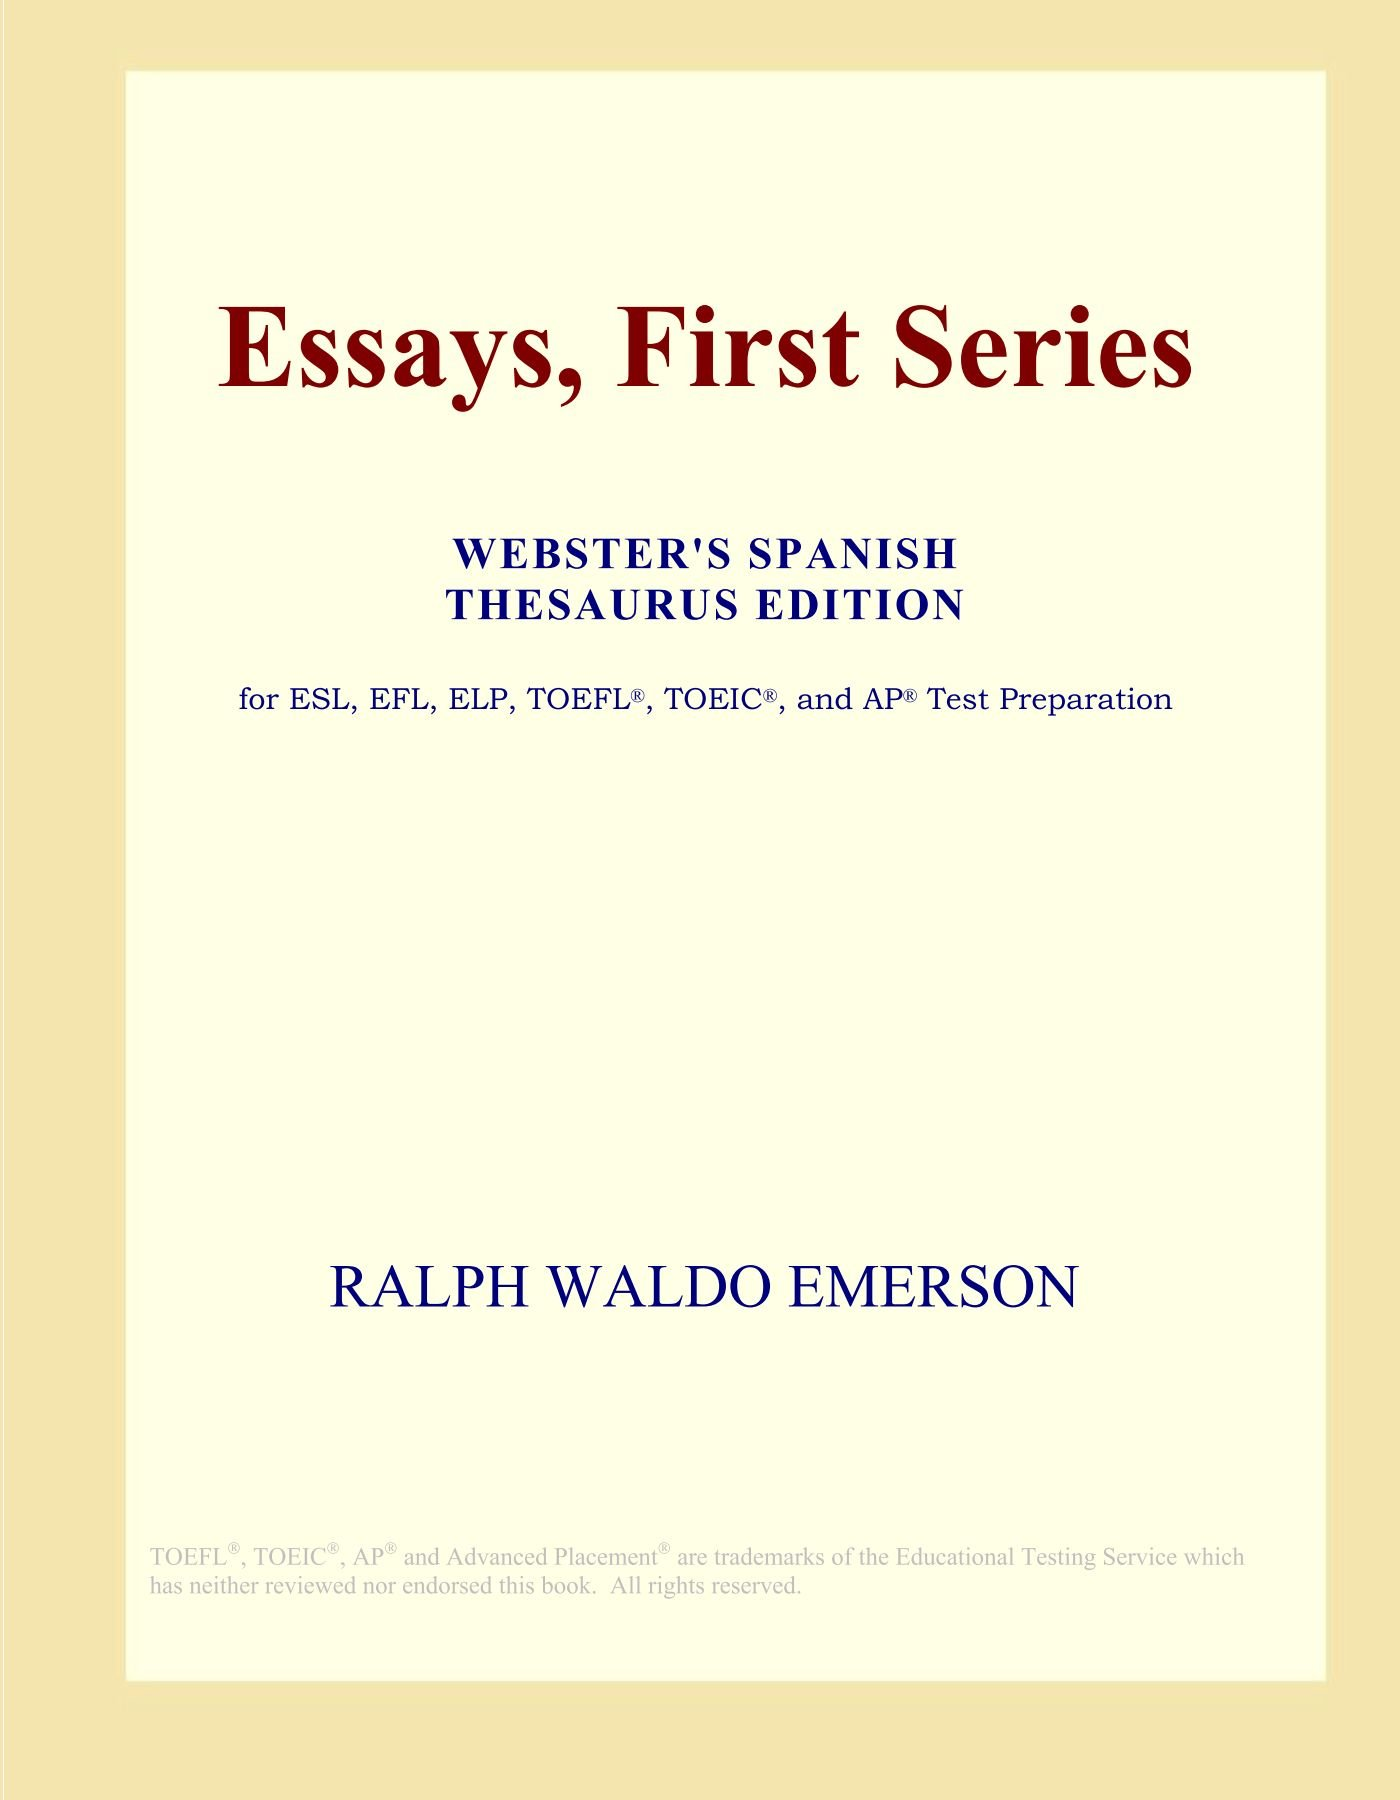 024 Essay Example 61cjxhnthzl Essays First Stunning Series Emerson Pdf Shelburne Publisher Full